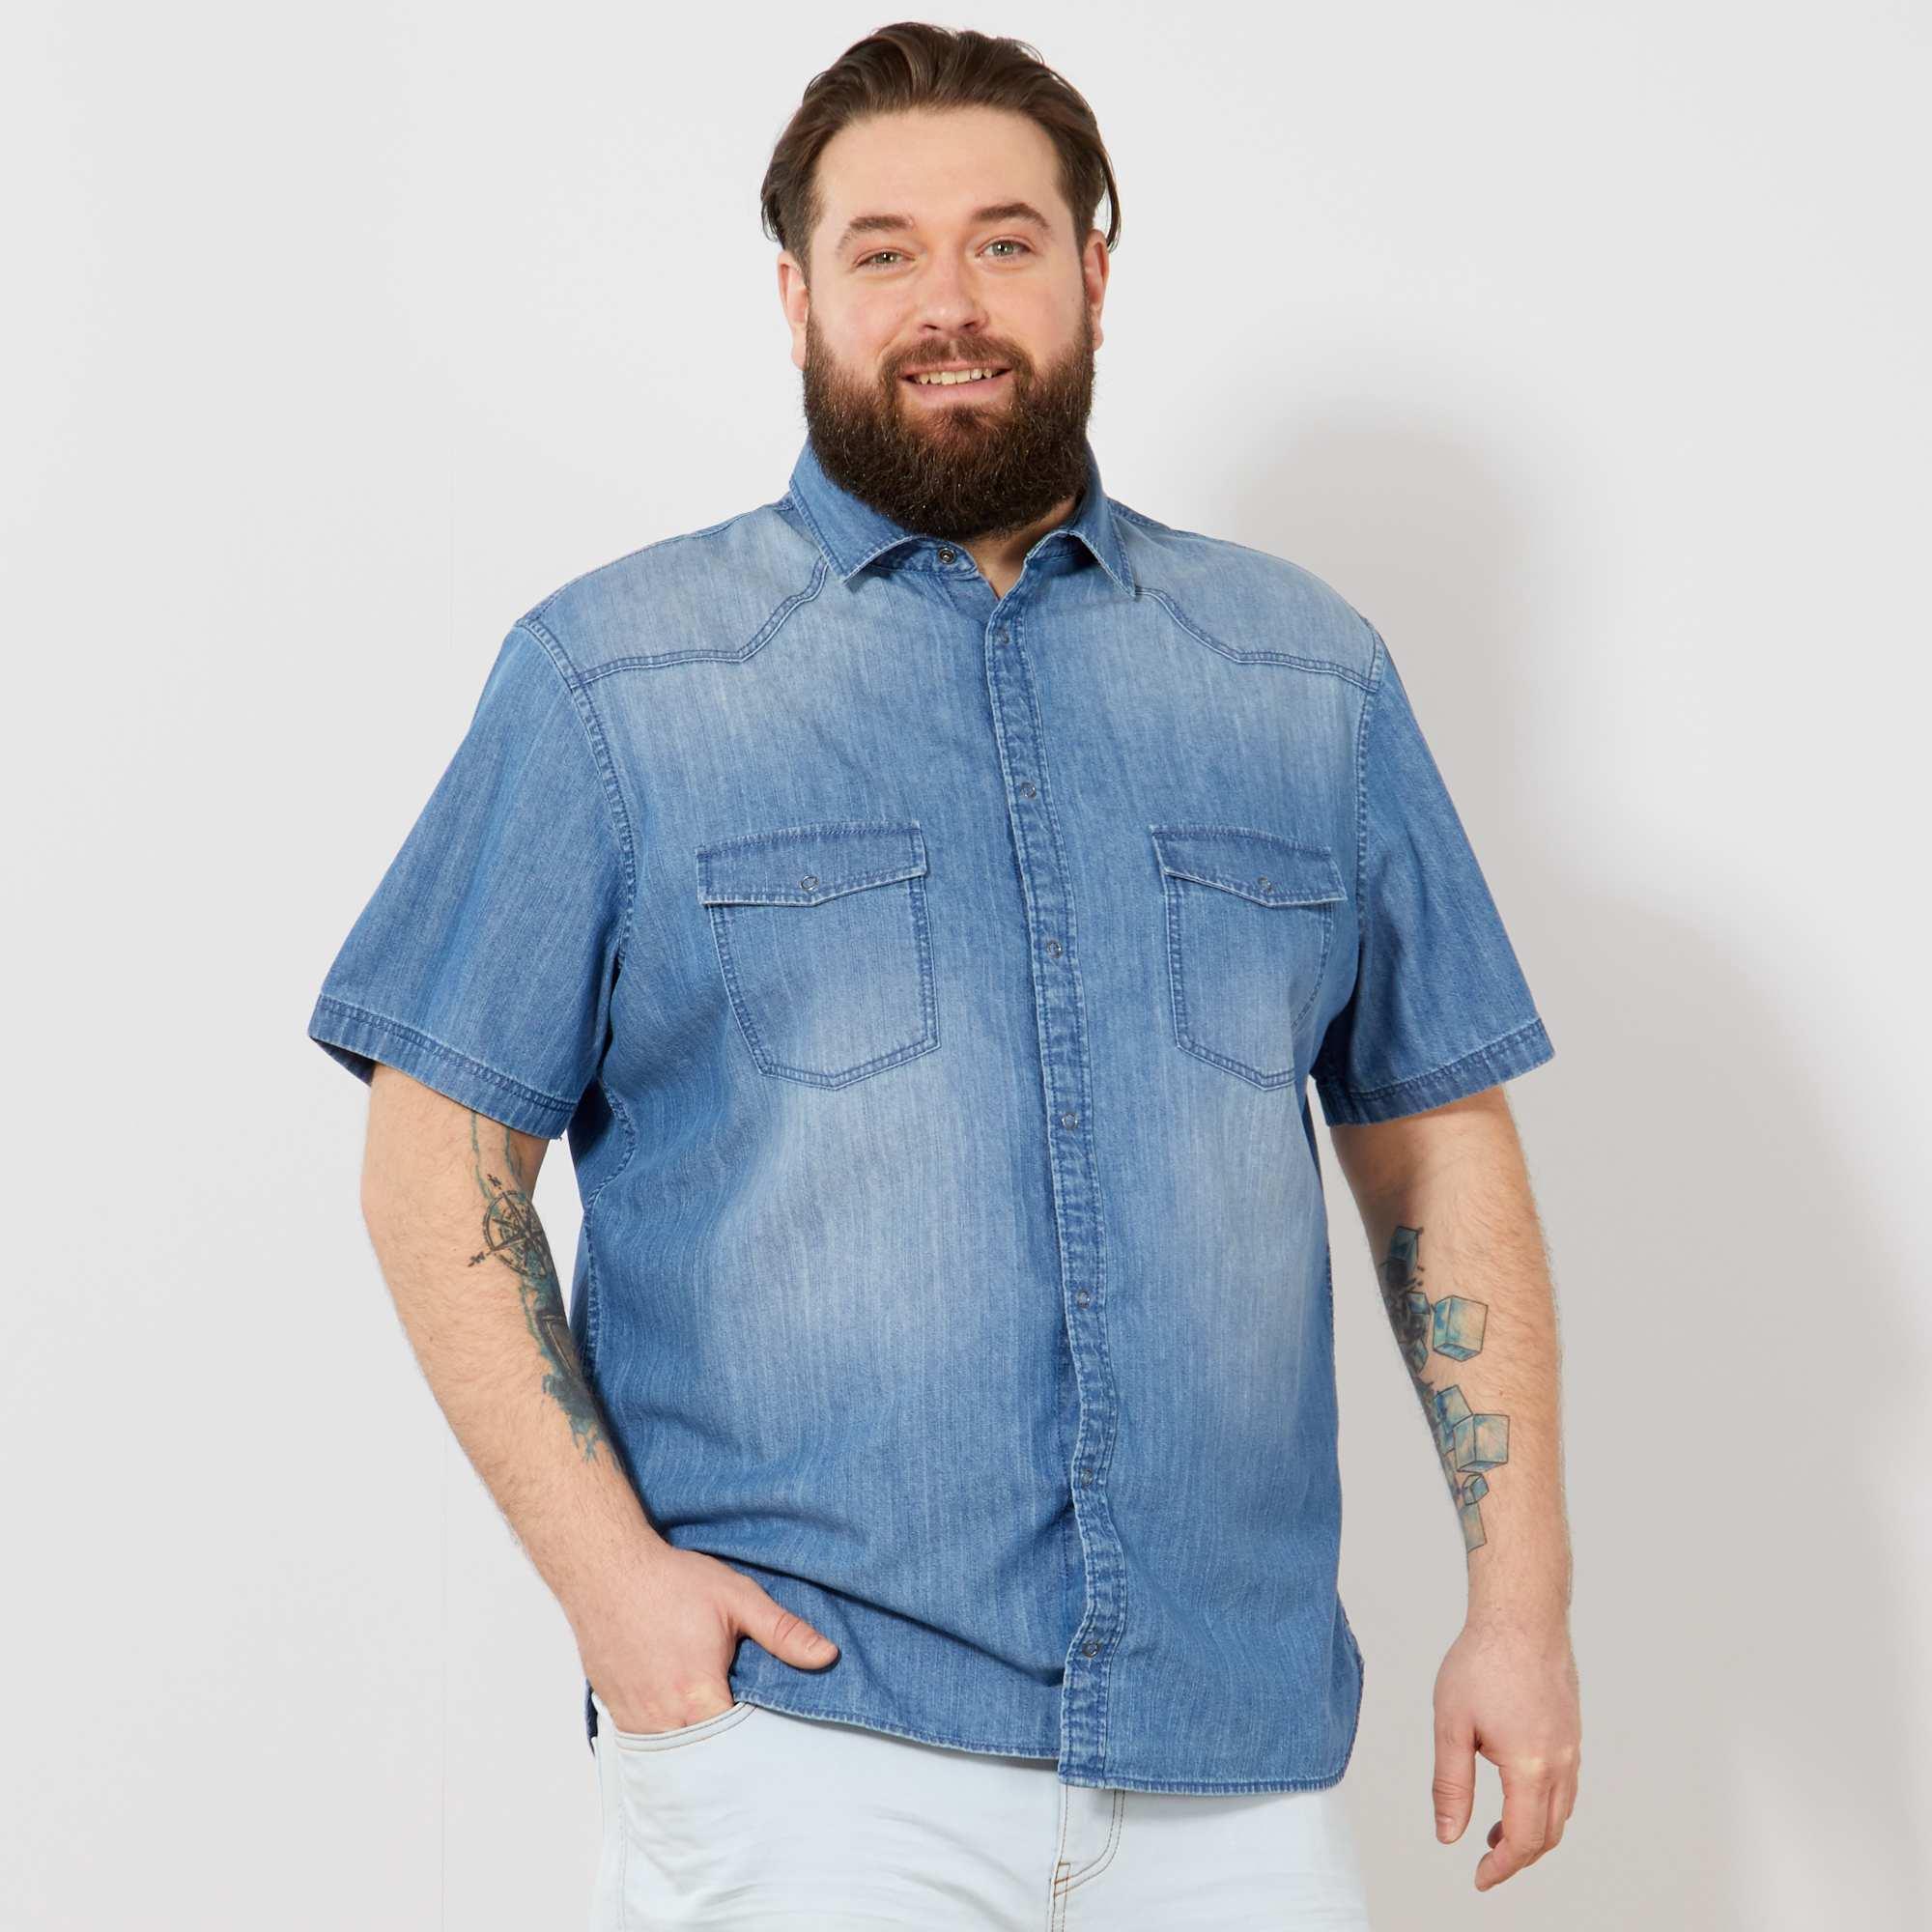 5cde8af741f6 Camicia jeans regular Taglie forti uomo - BLU - Kiabi - 15